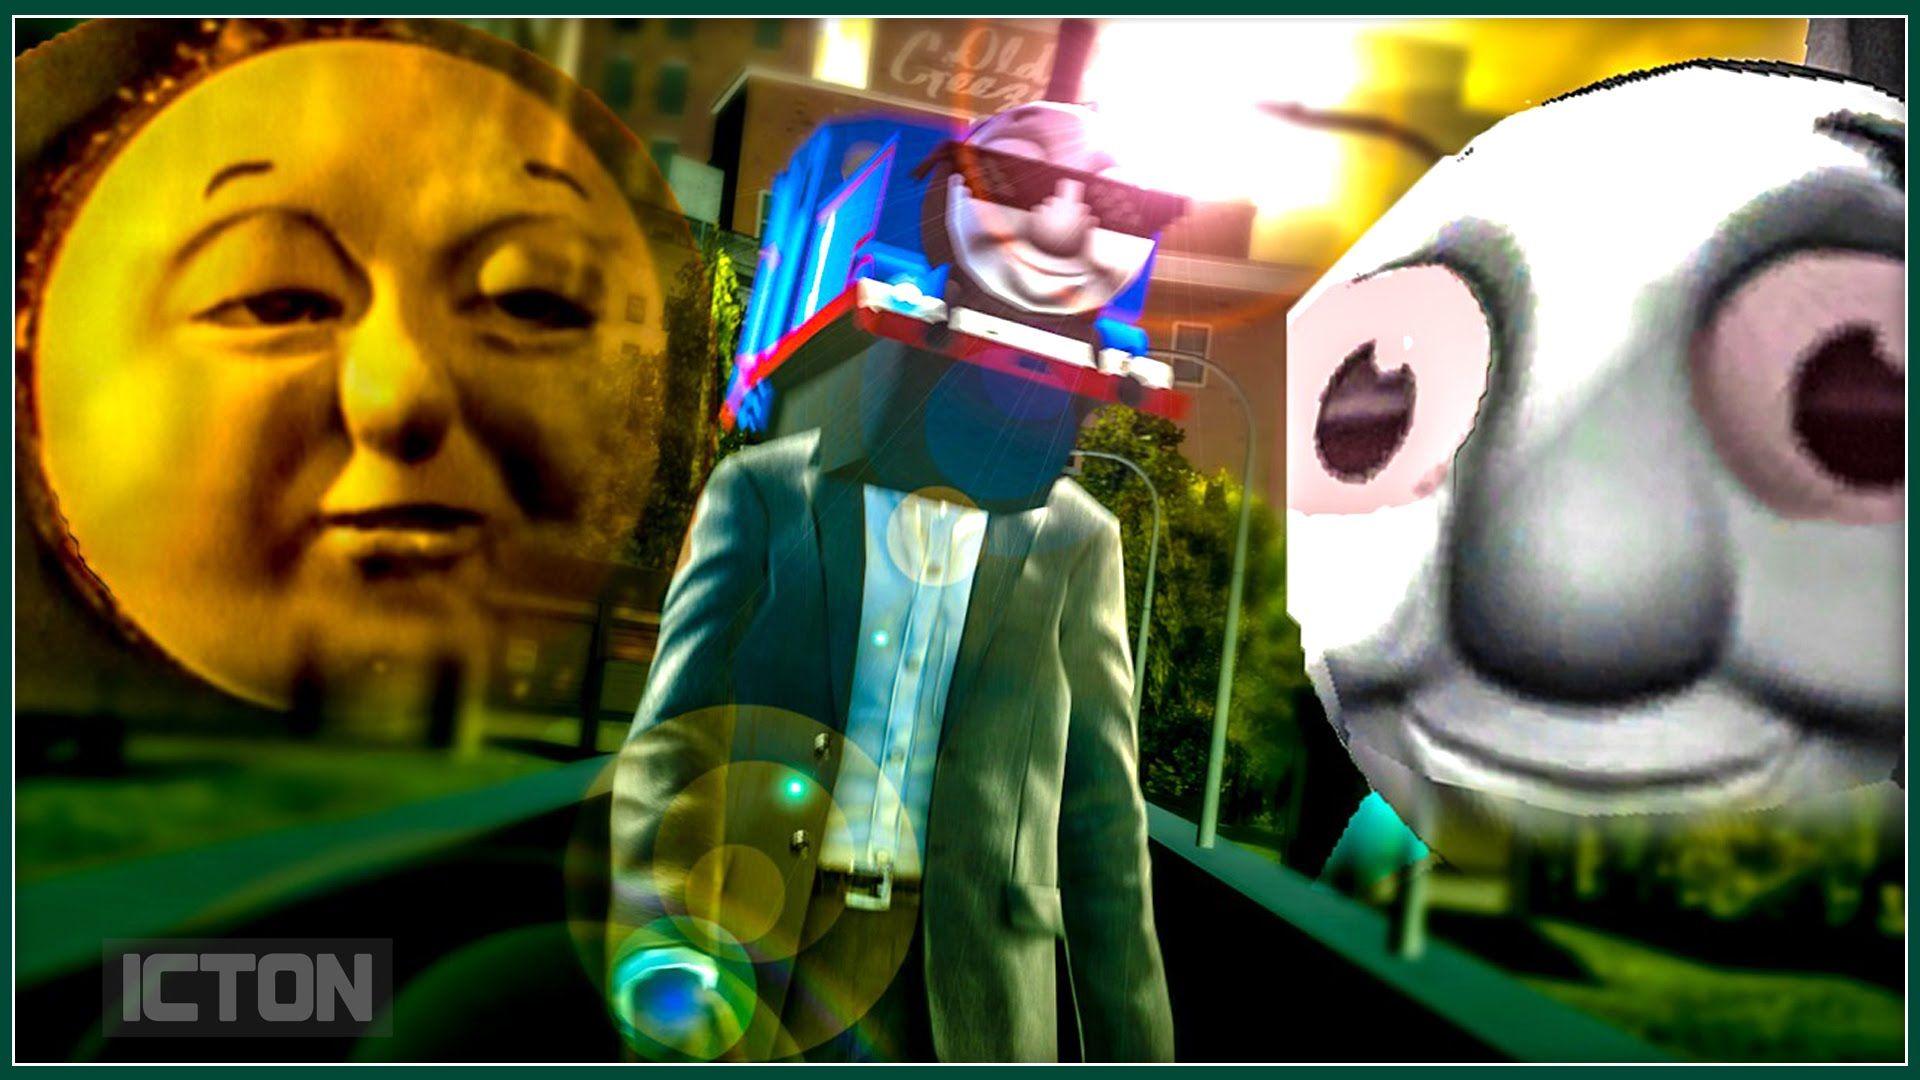 Thomas The Dank Engine Sfm Music Video Animated Music Videos Youtube Videos Music Music Videos